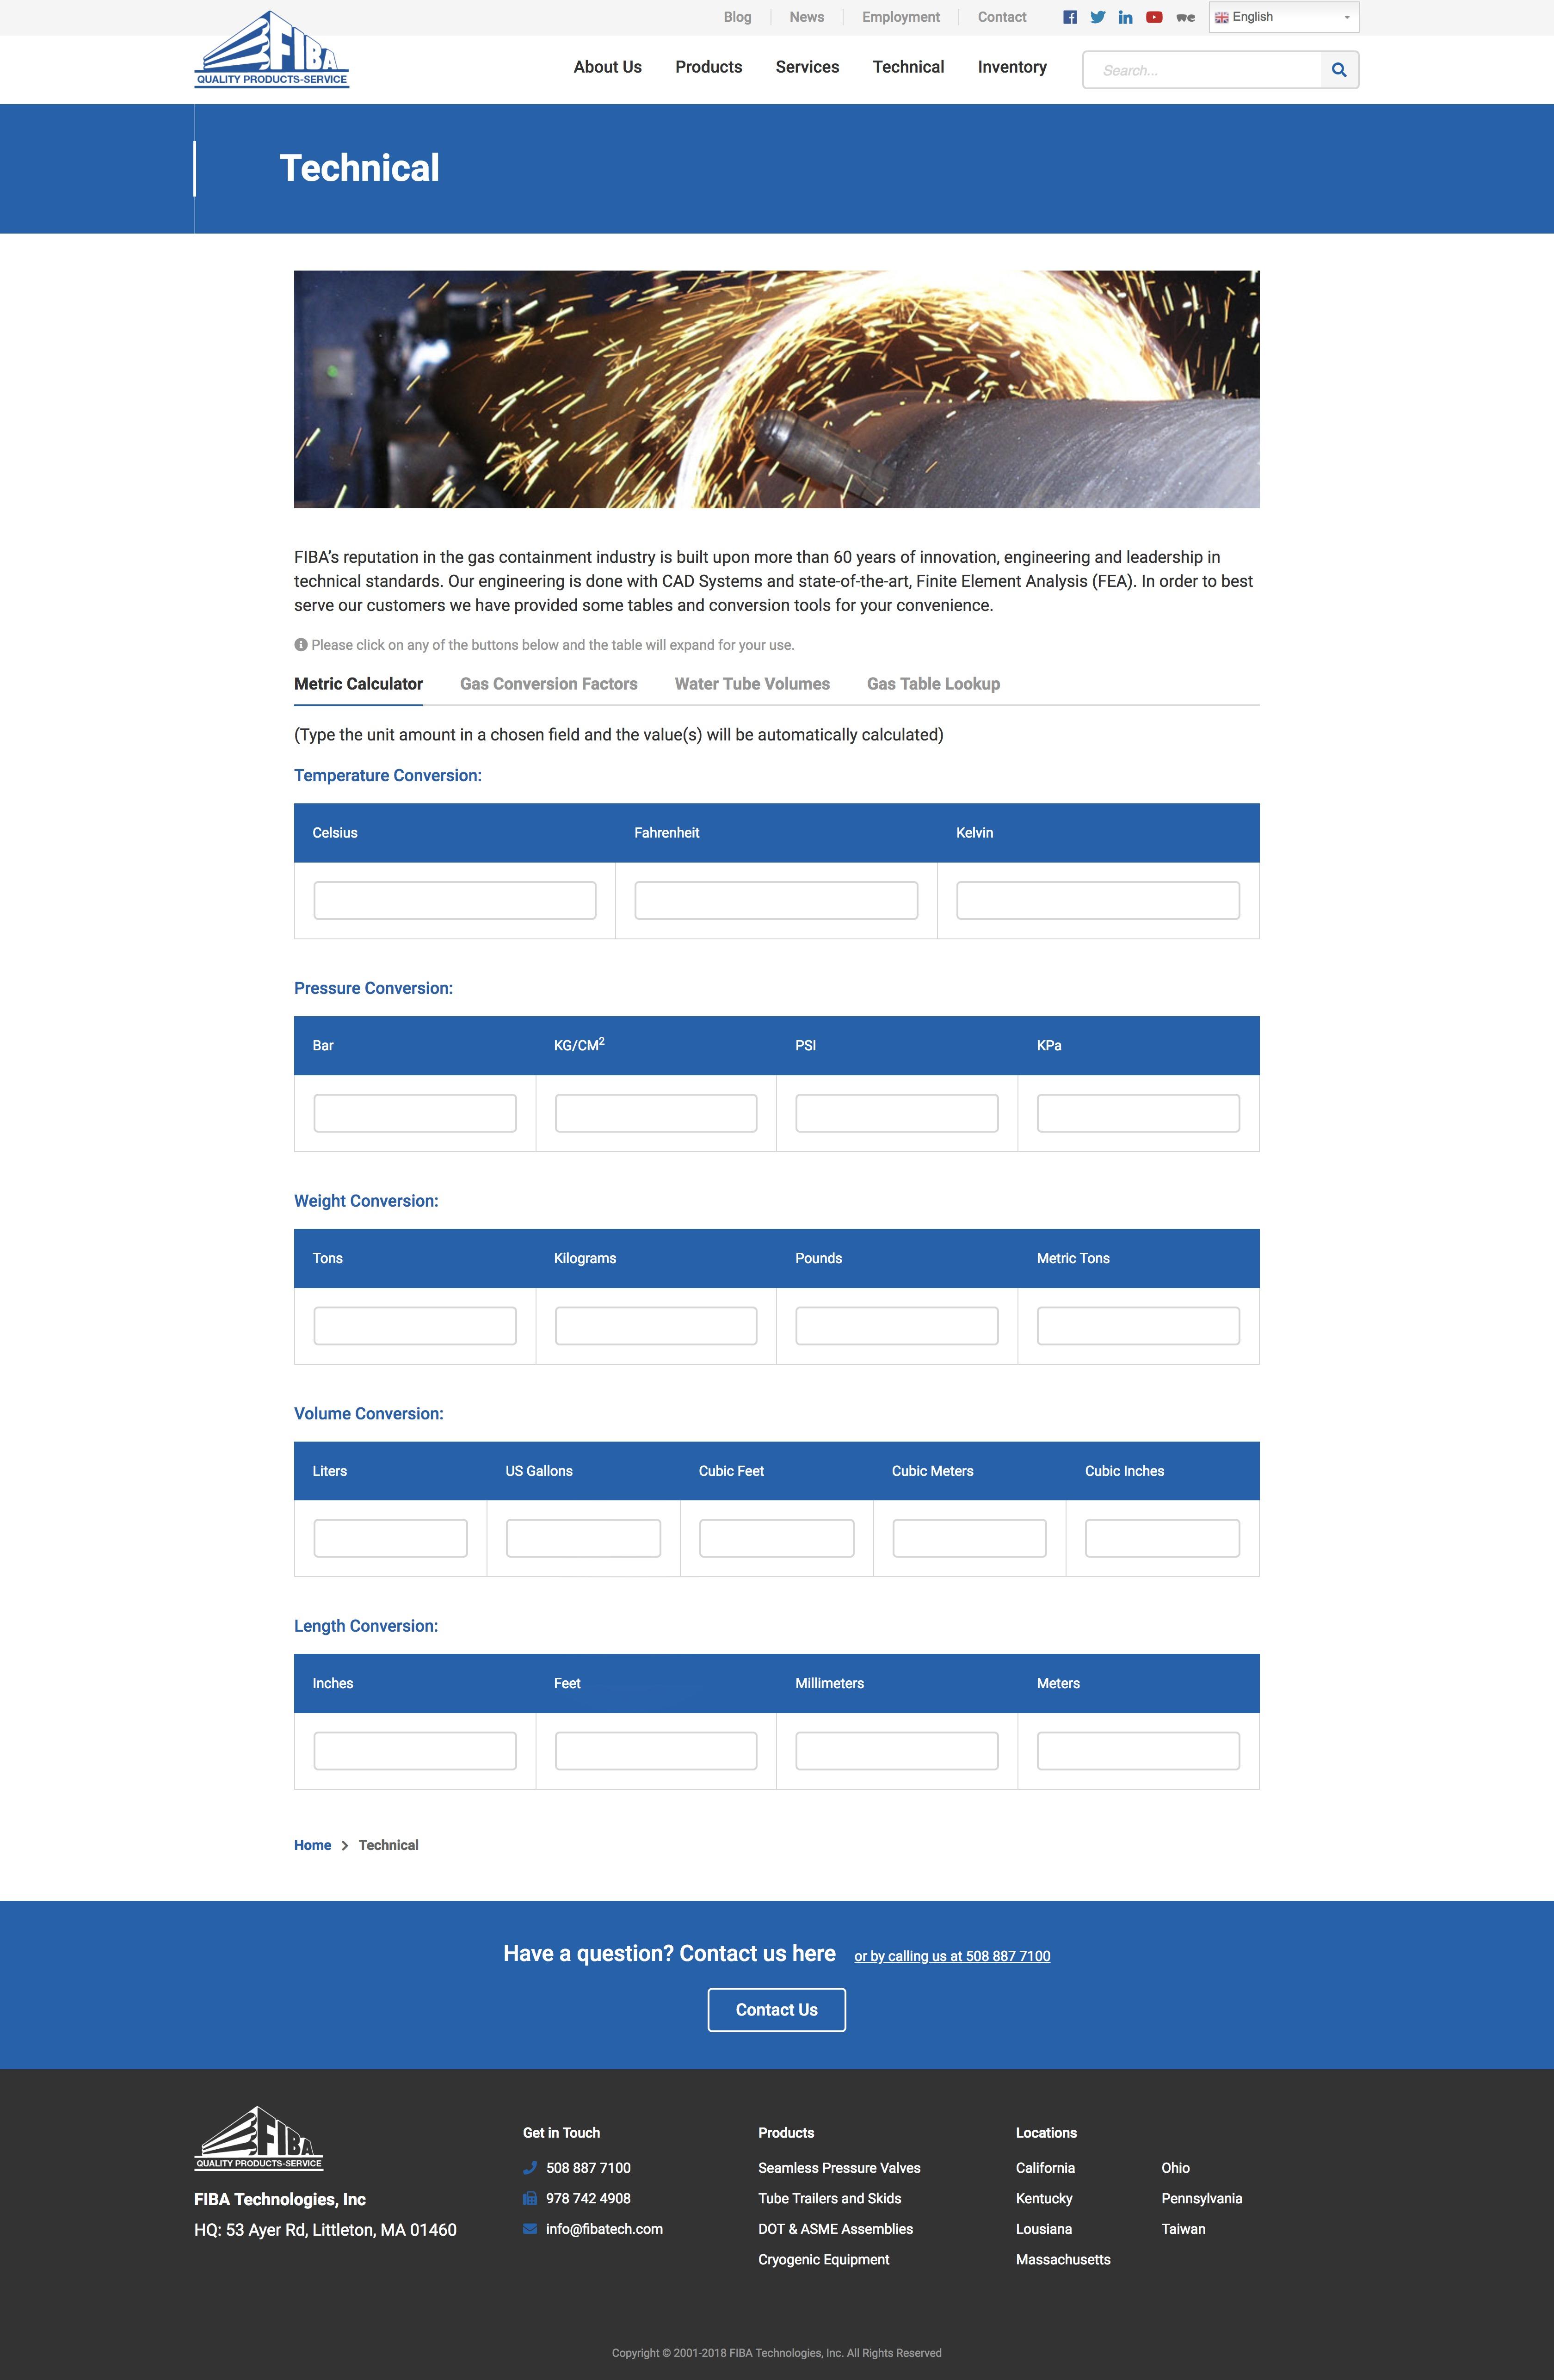 FIBA Tech technical resources page